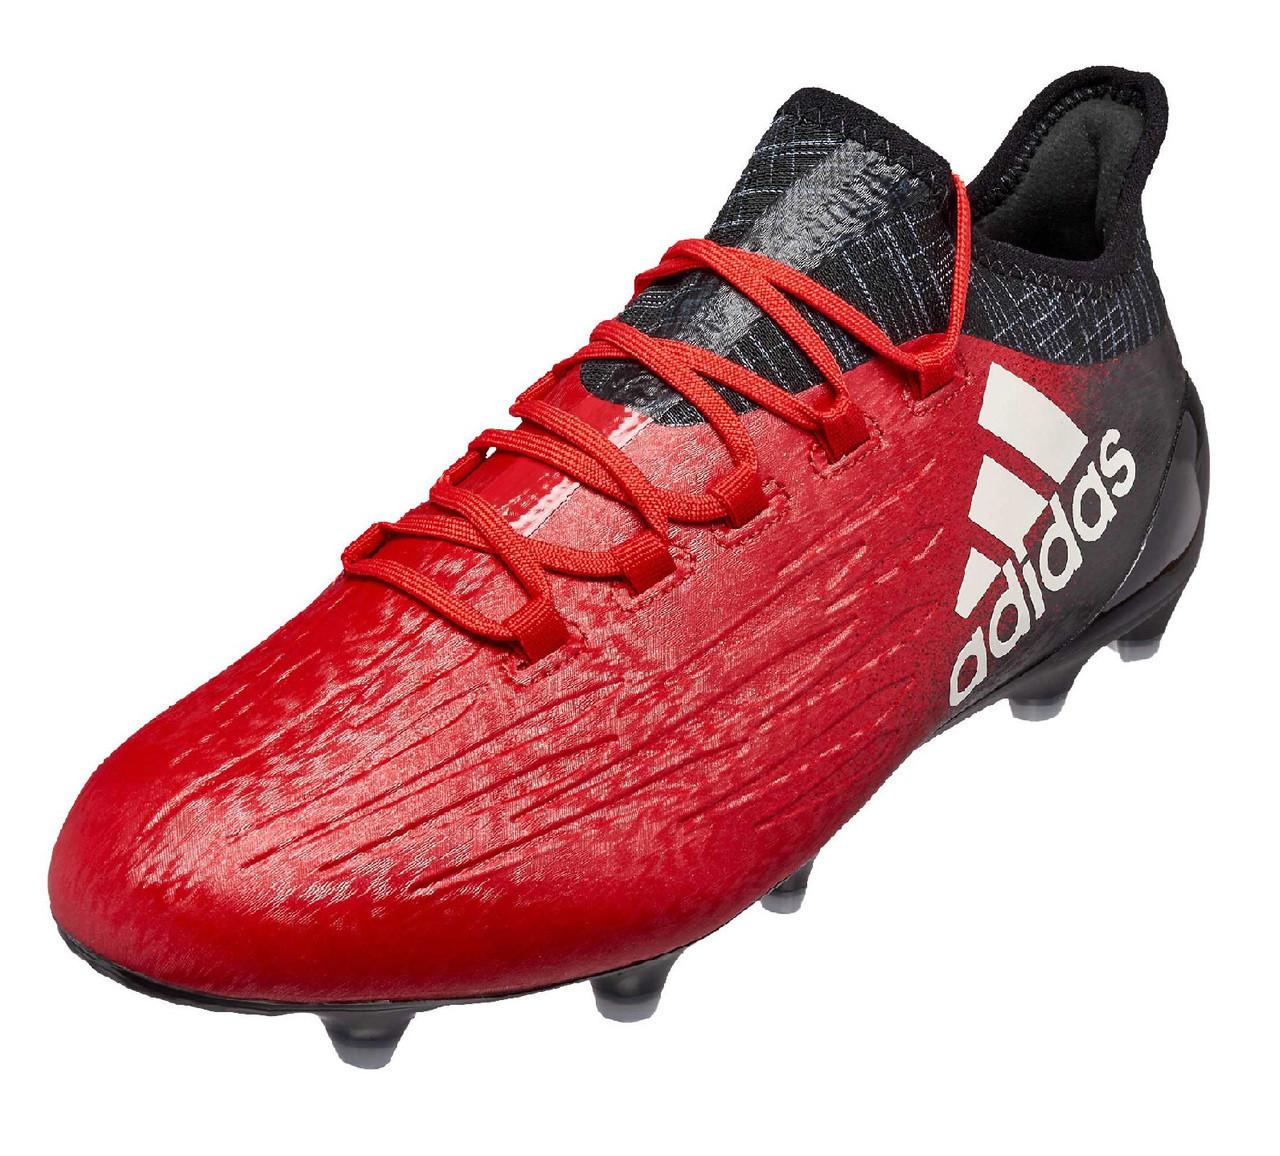 adidas X 16.1 FG - Red  White Core Black (10717) - ohp soccer 40291fb136043